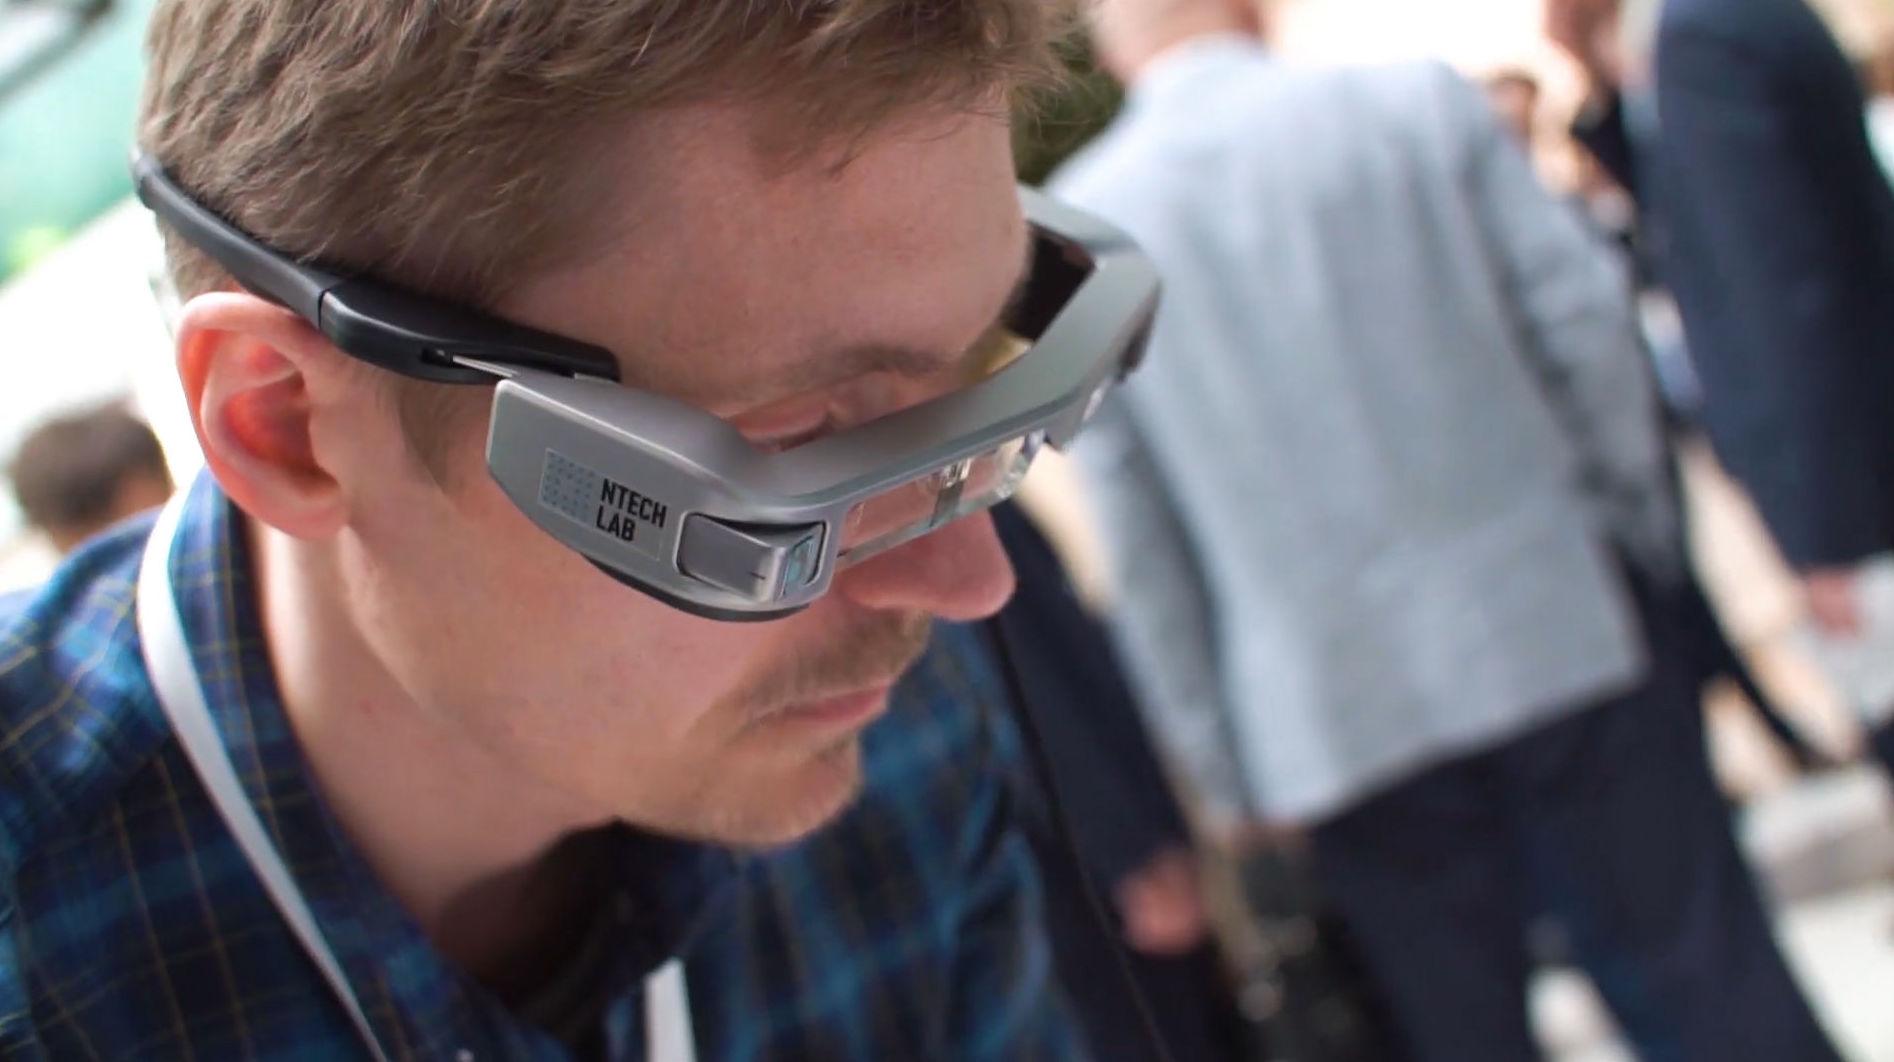 Gafas inteligentes de NtechLab